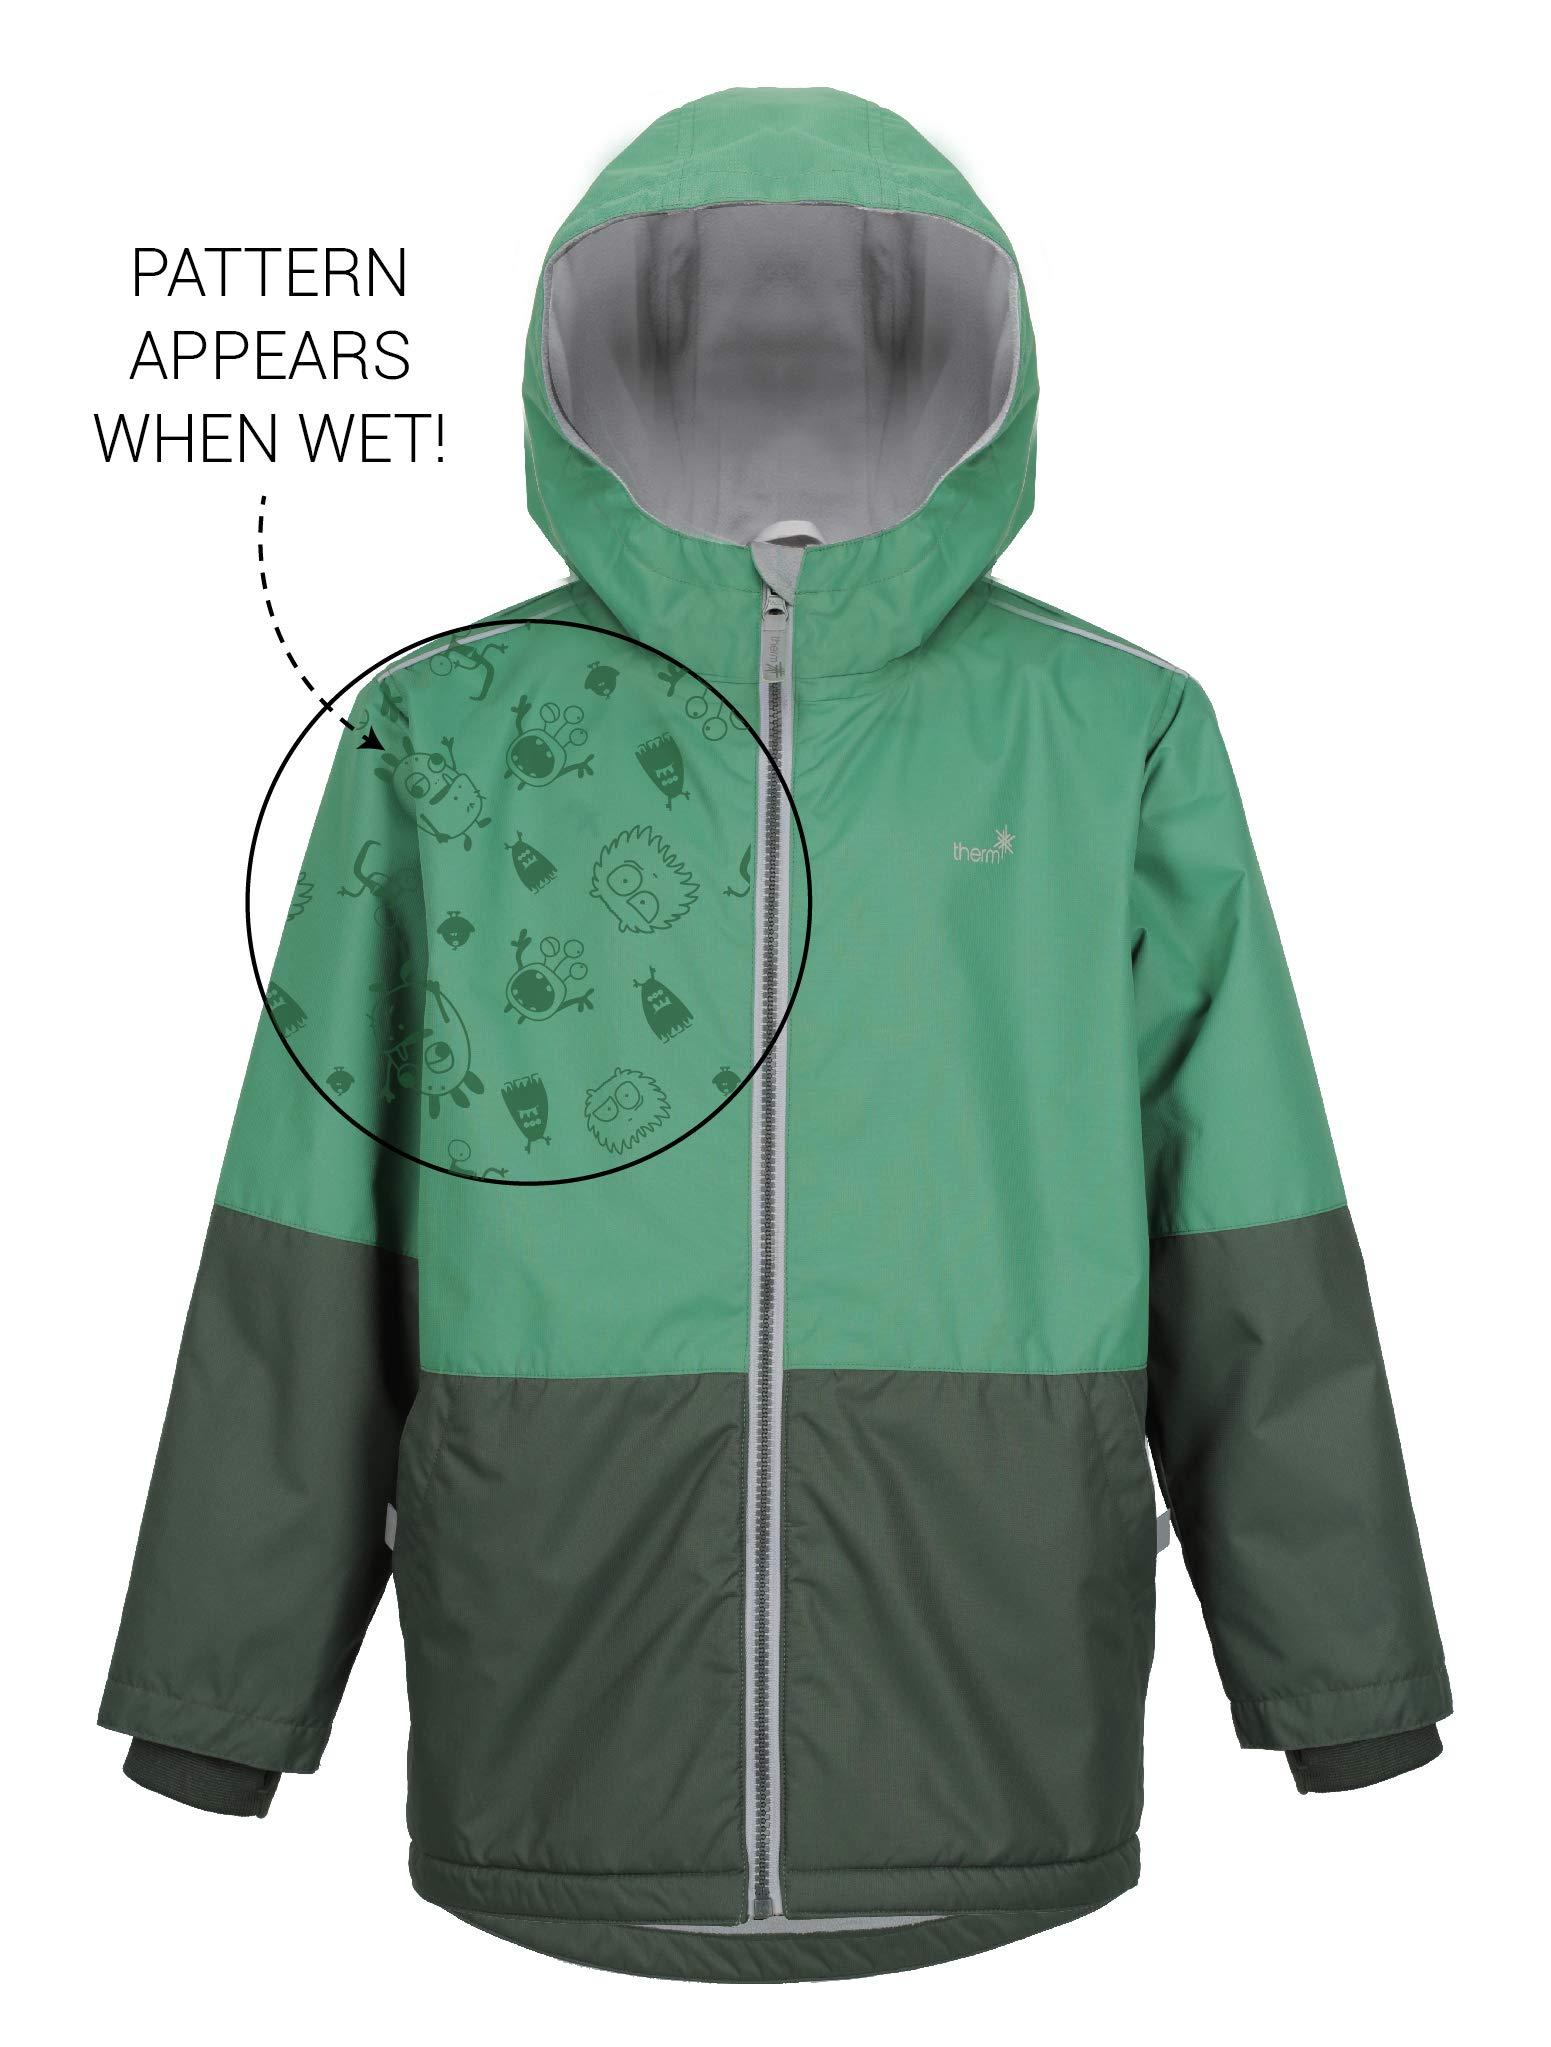 Therm SplashMagic Raincoat, Lightweight Waterproof Boys Rain Jacket with Magic Pattern (10, Army Green)